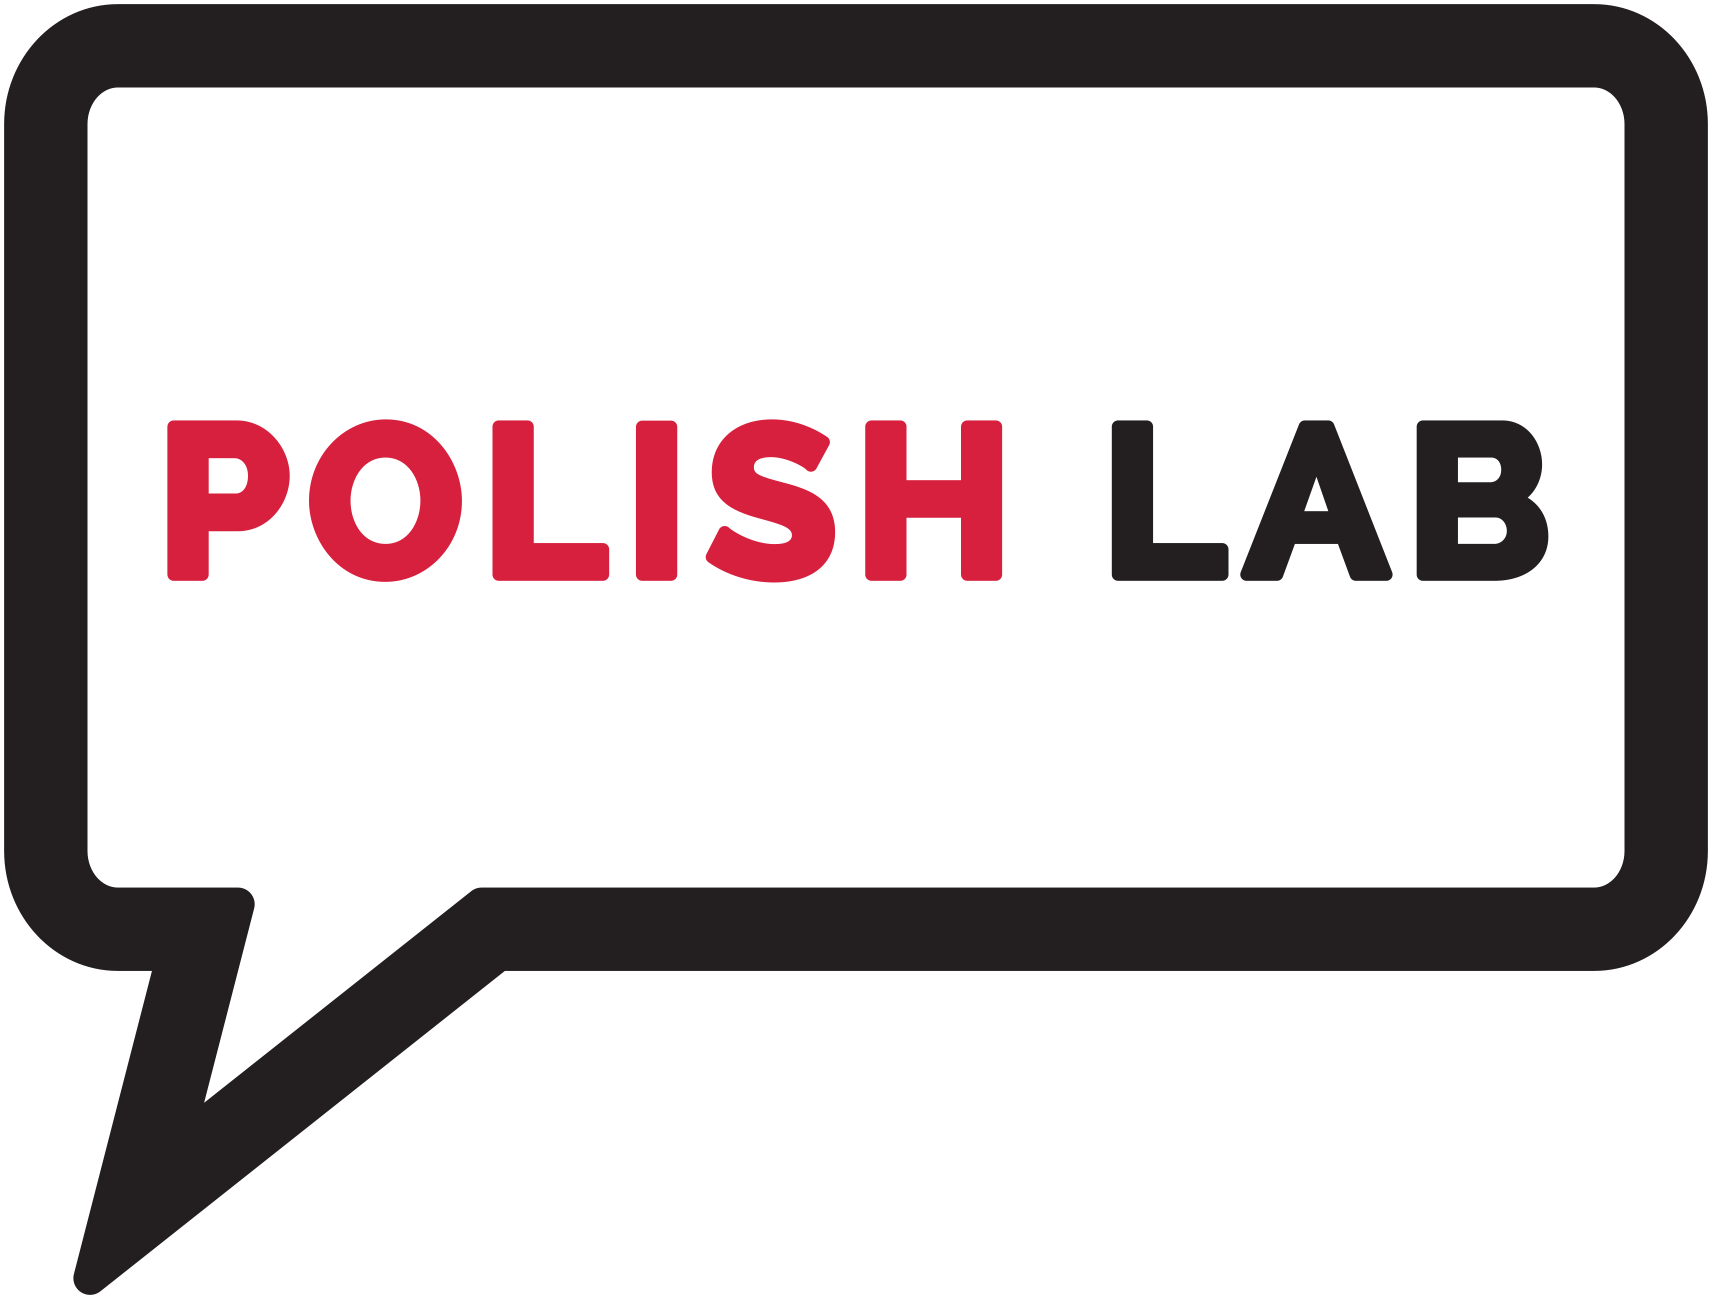 Polish Lab